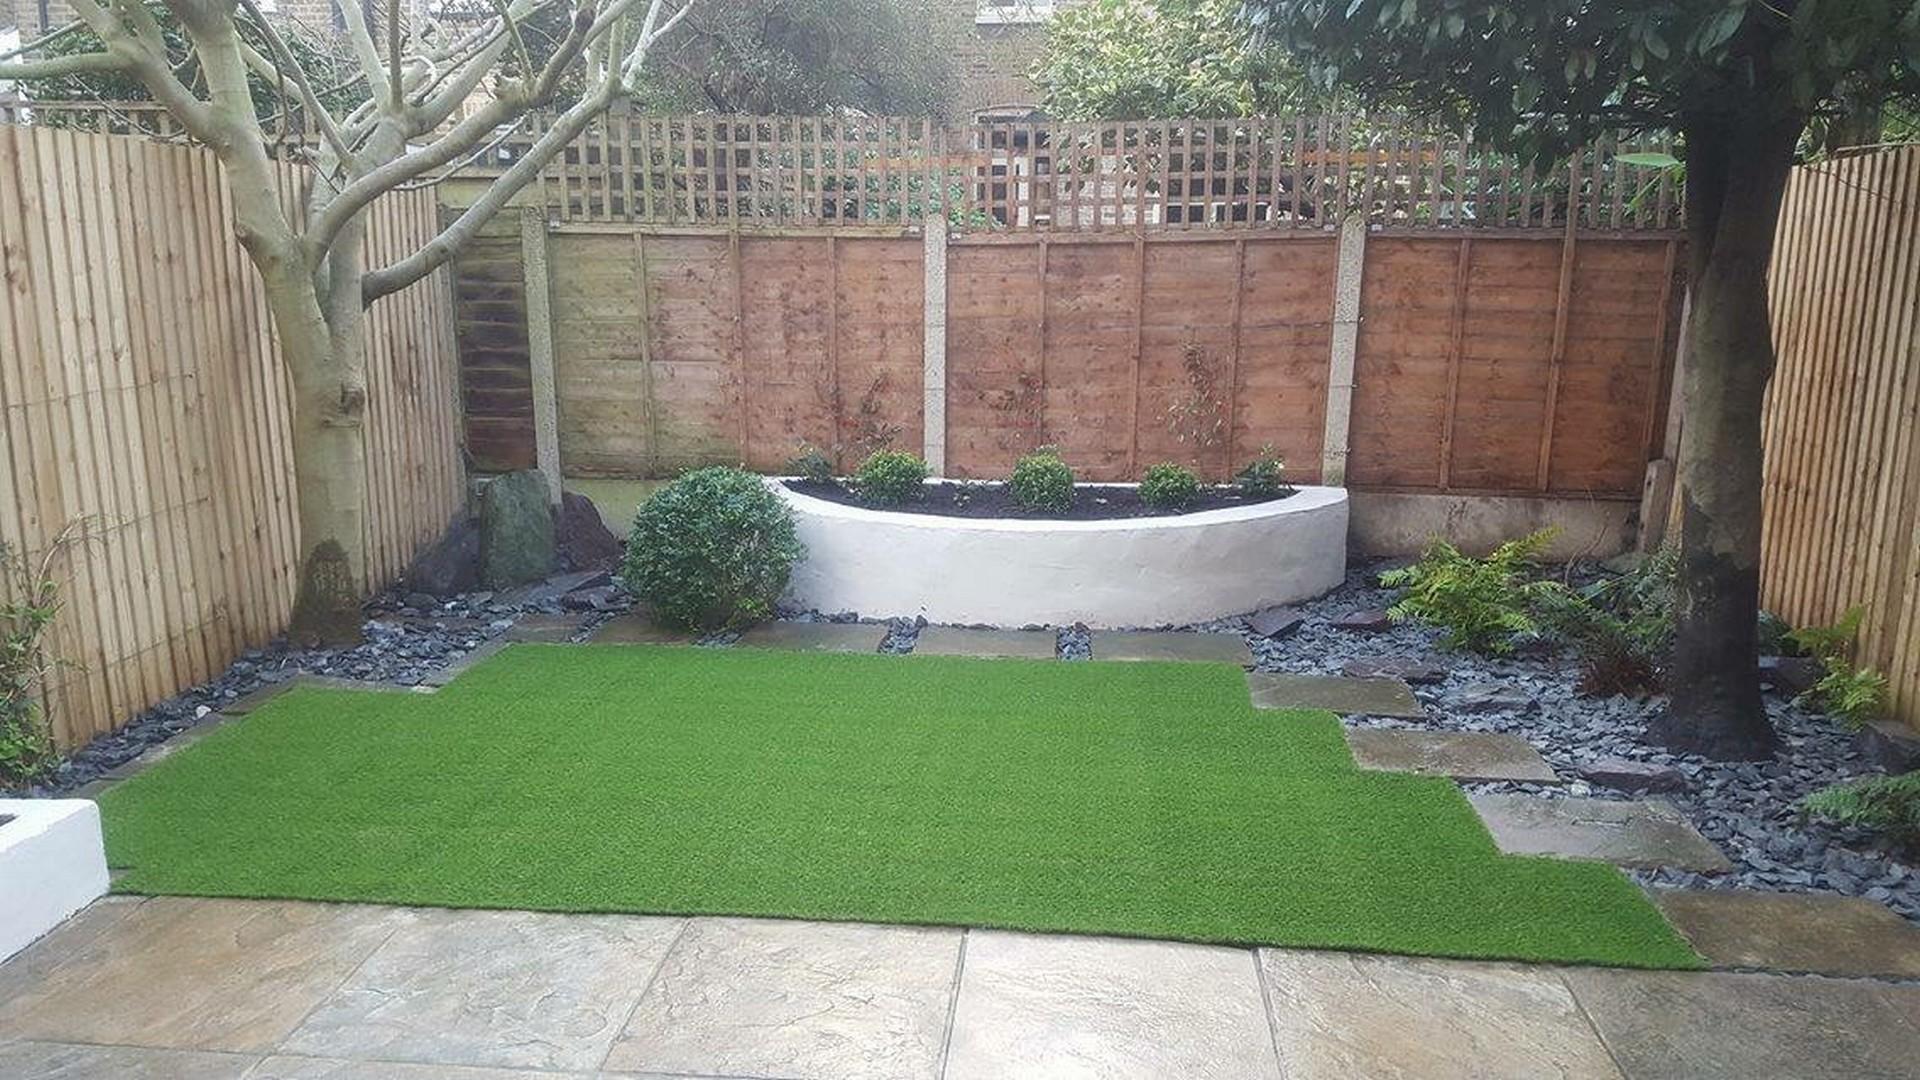 Wandsworth. Minimal maintenance landscaping/planting.